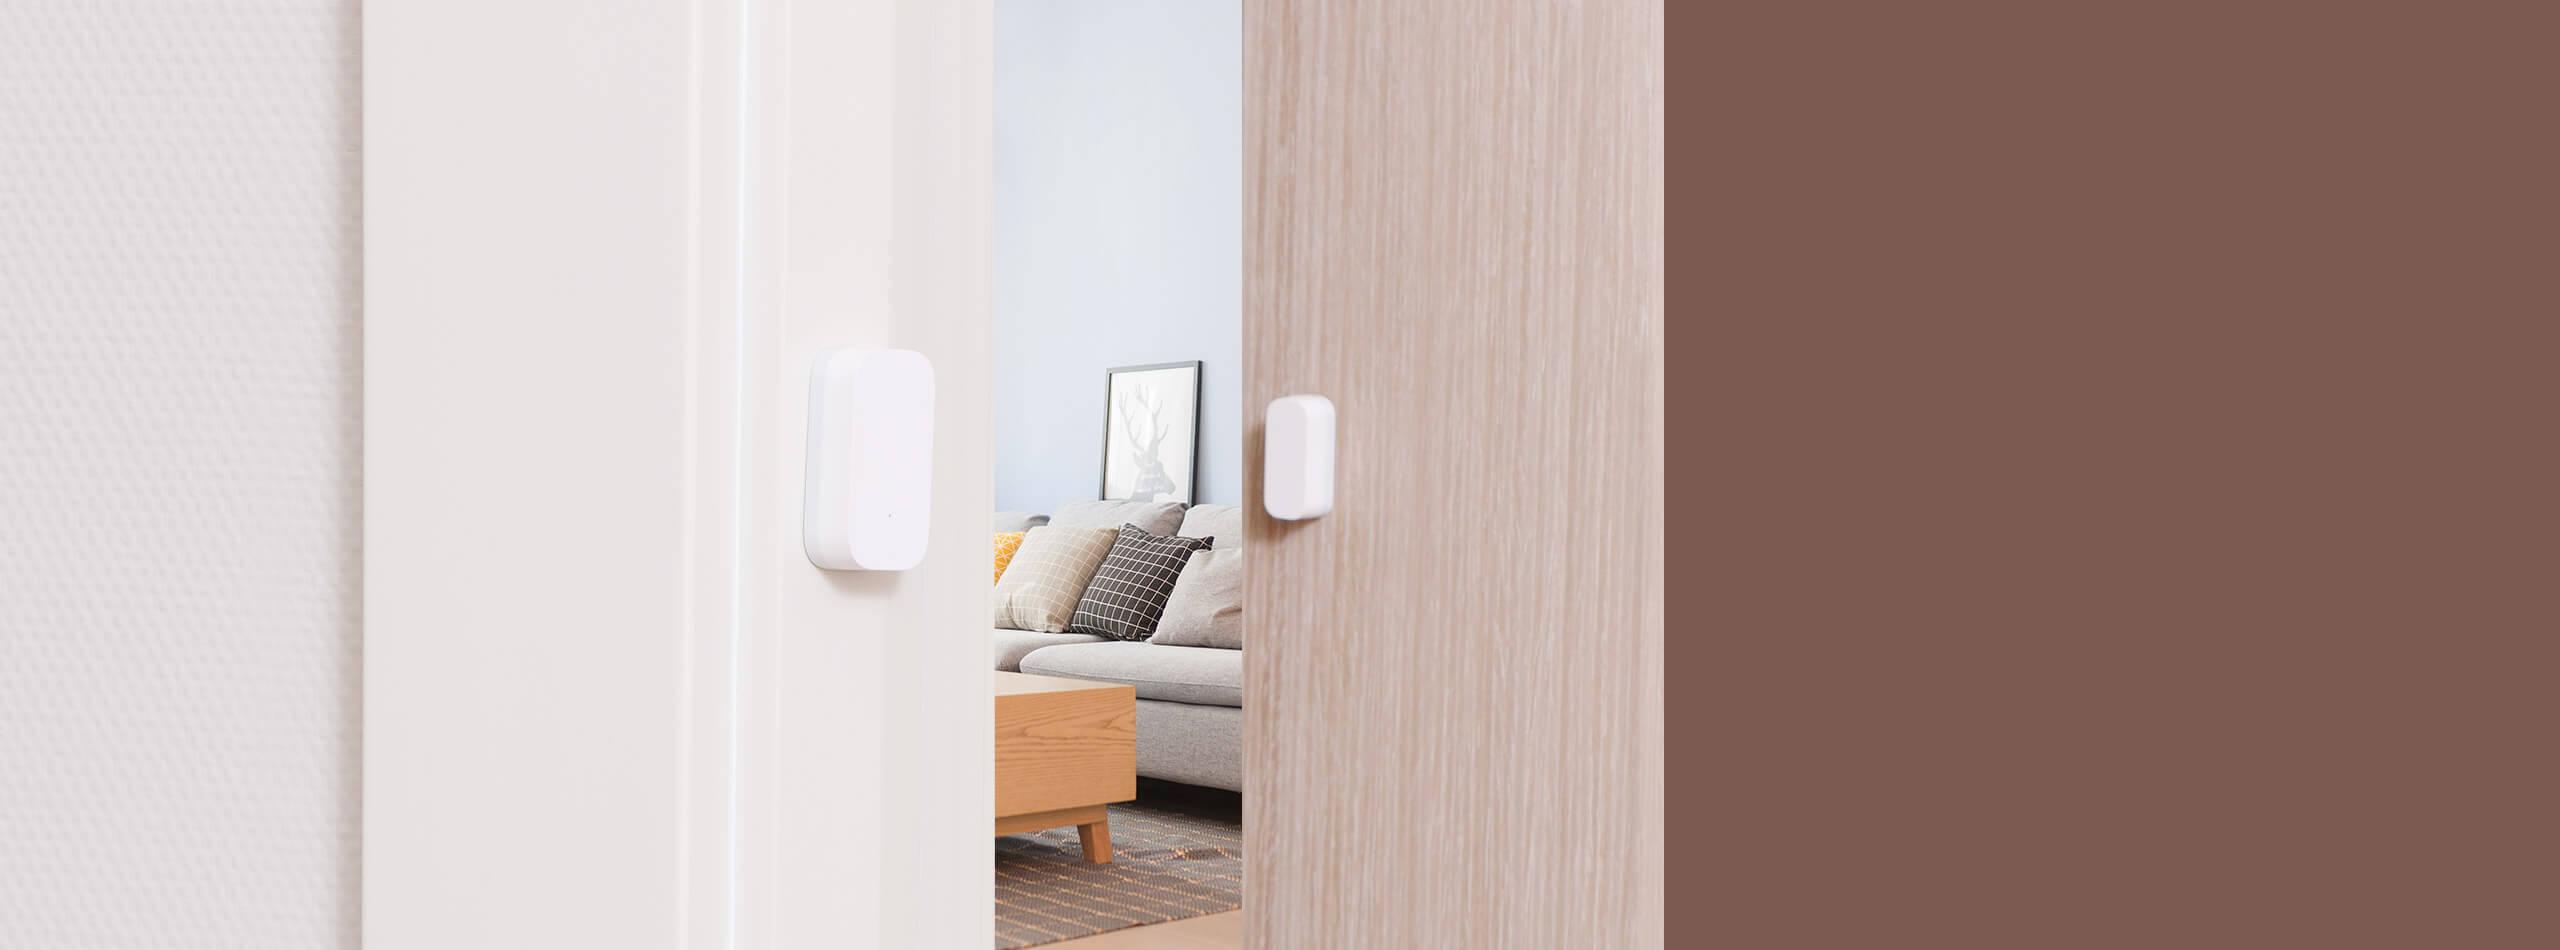 Aqara 门窗传感器 - 智能感知每扇门窗